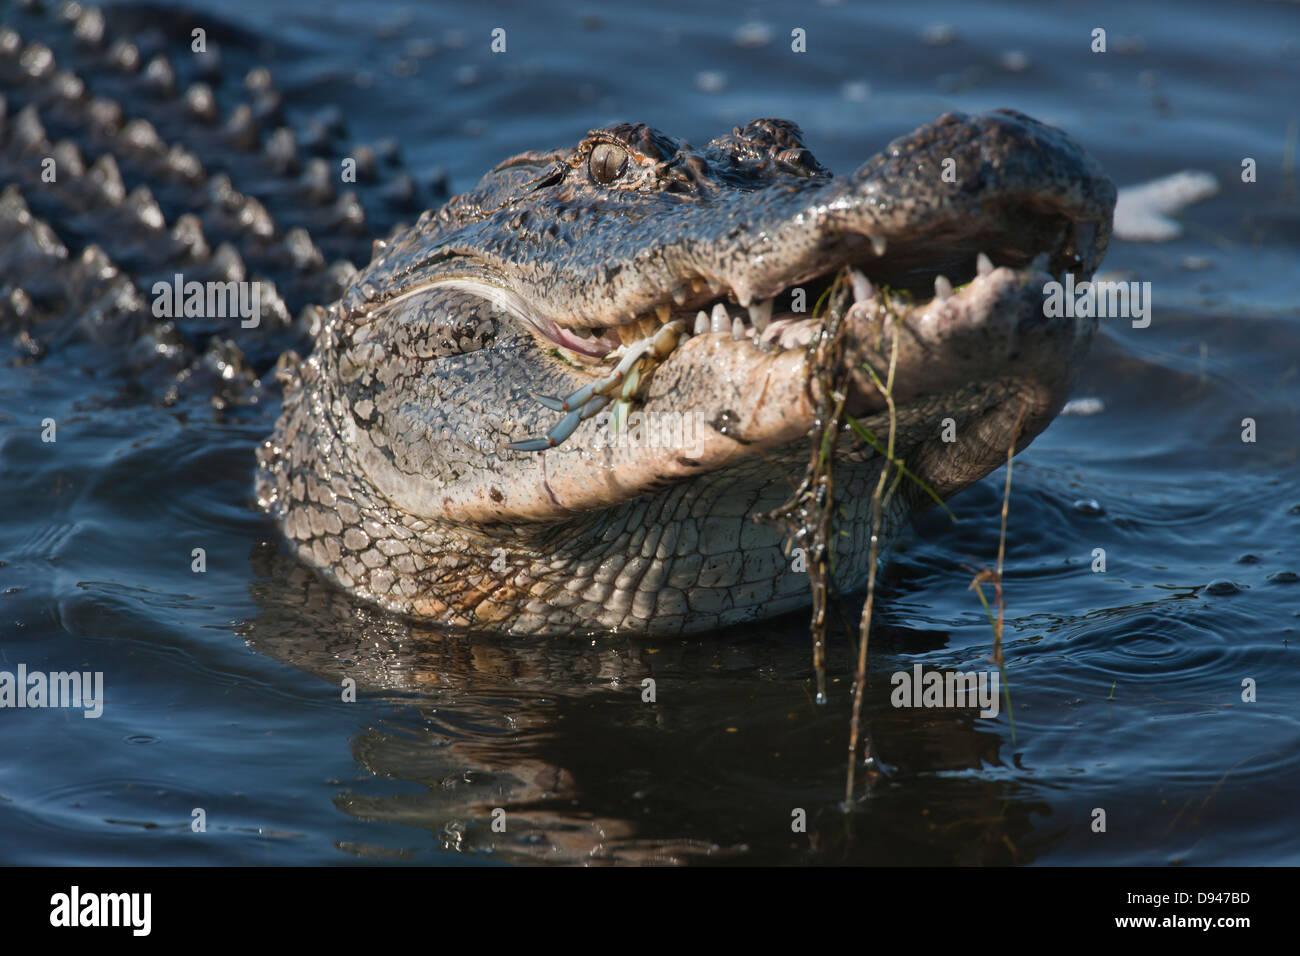 American alligator eating habits